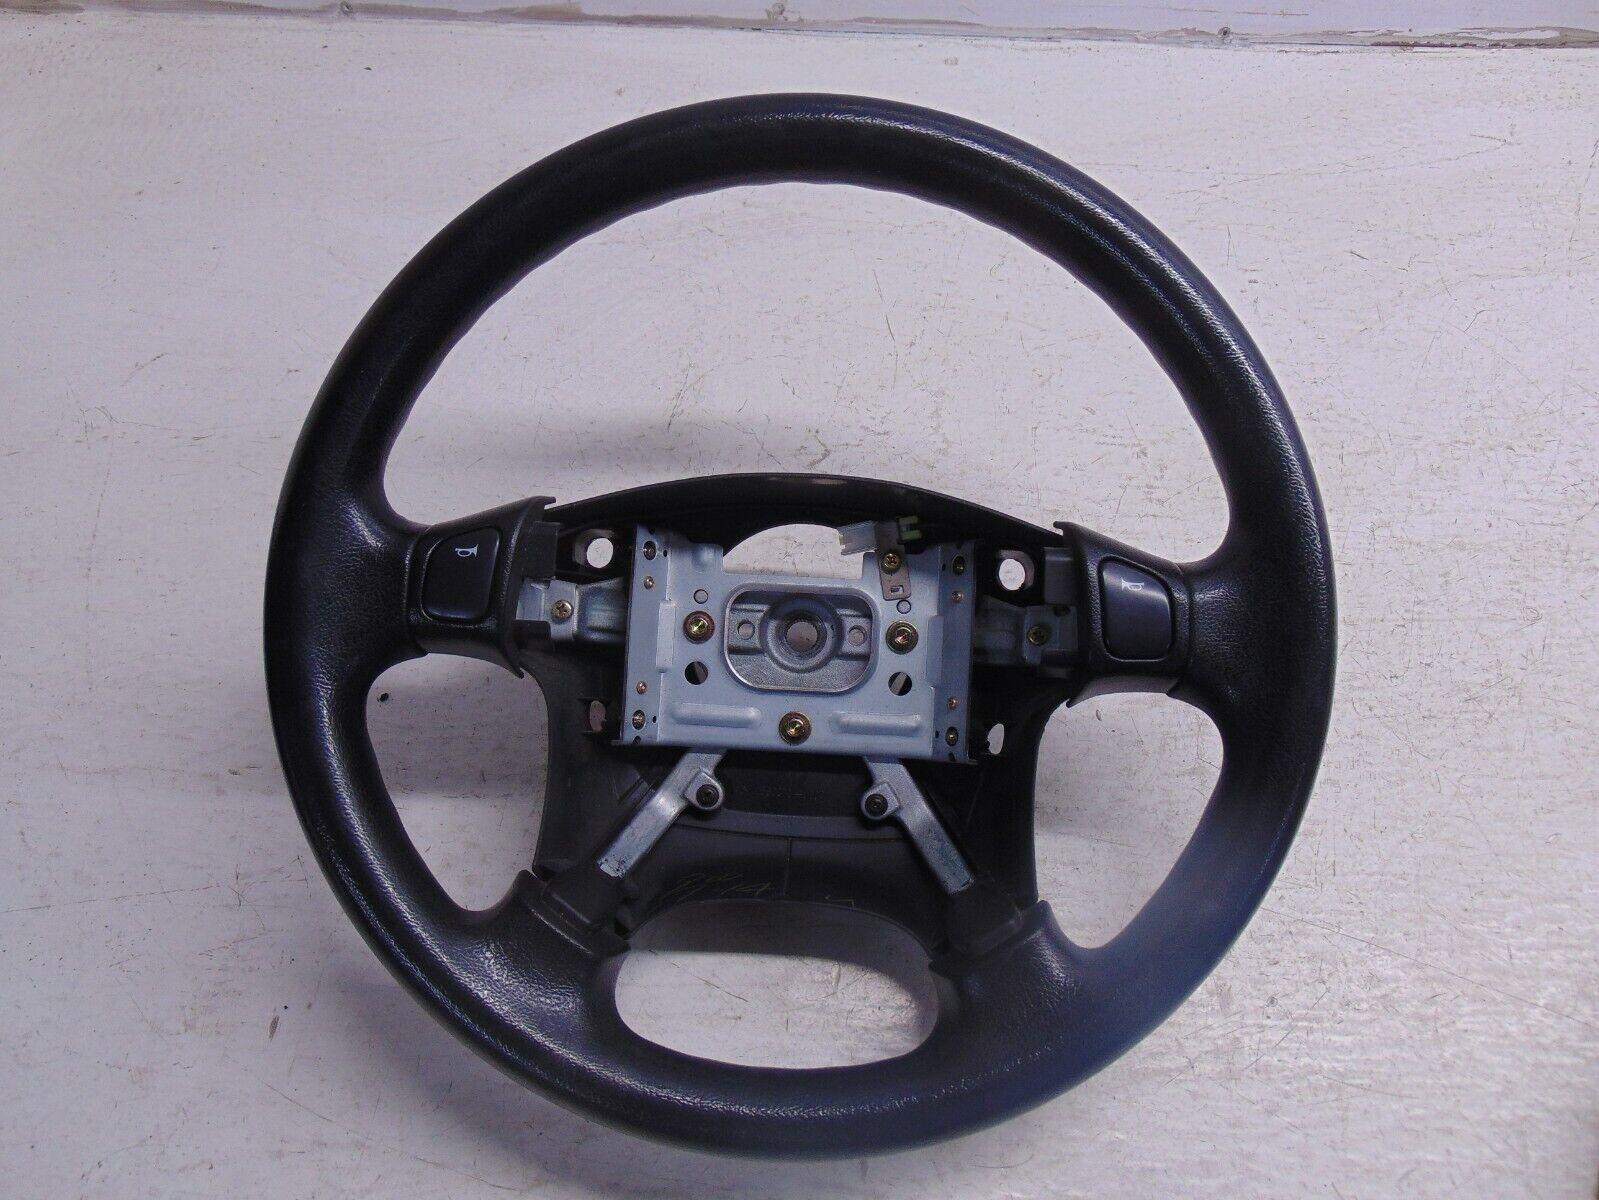 Used Isuzu Trooper Steering Wheels and Horns for Sale